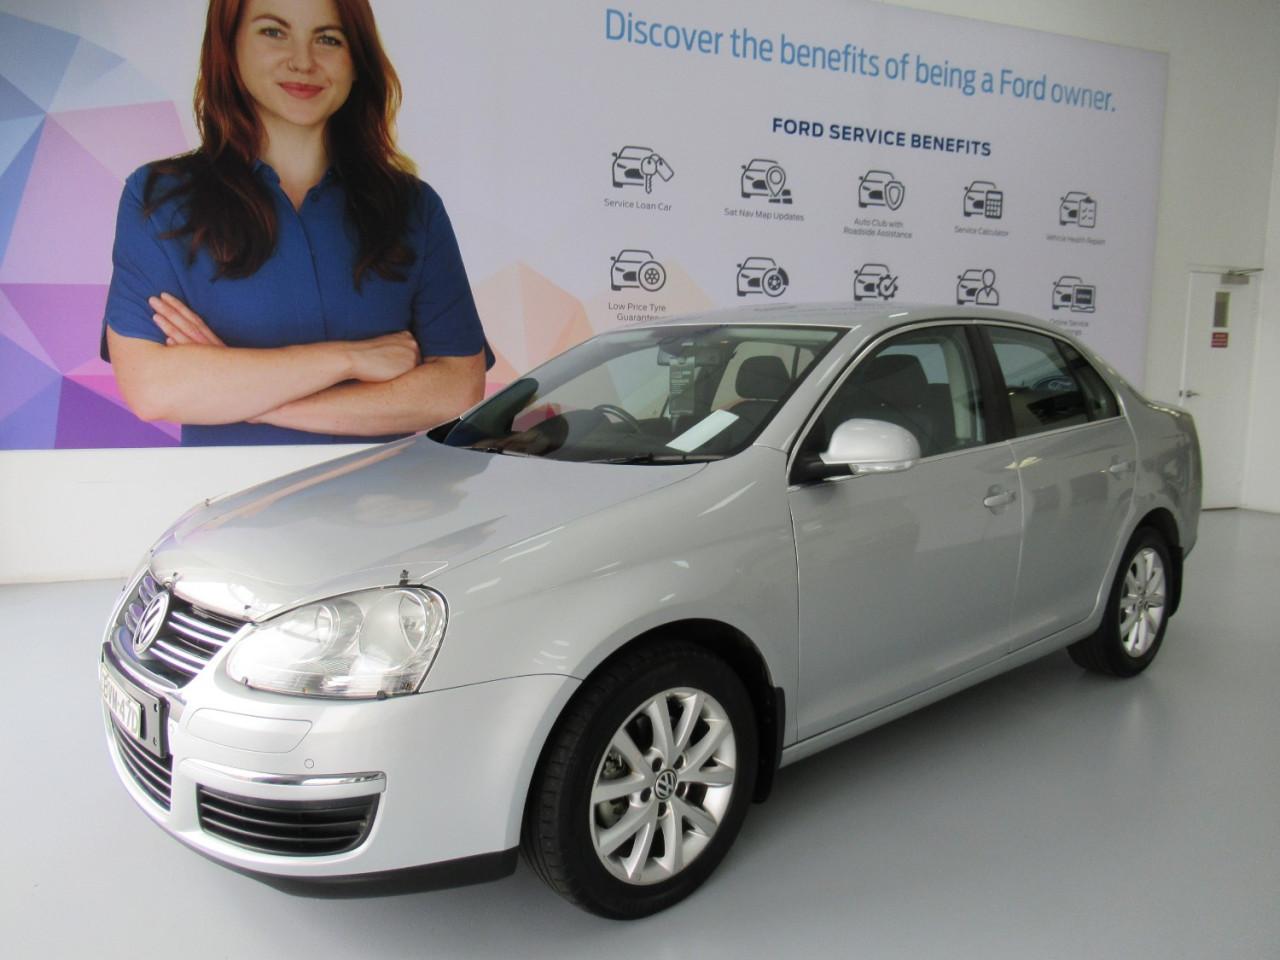 2010 Volkswagen Jetta 1KM MY10 103TDI Sedan Image 1